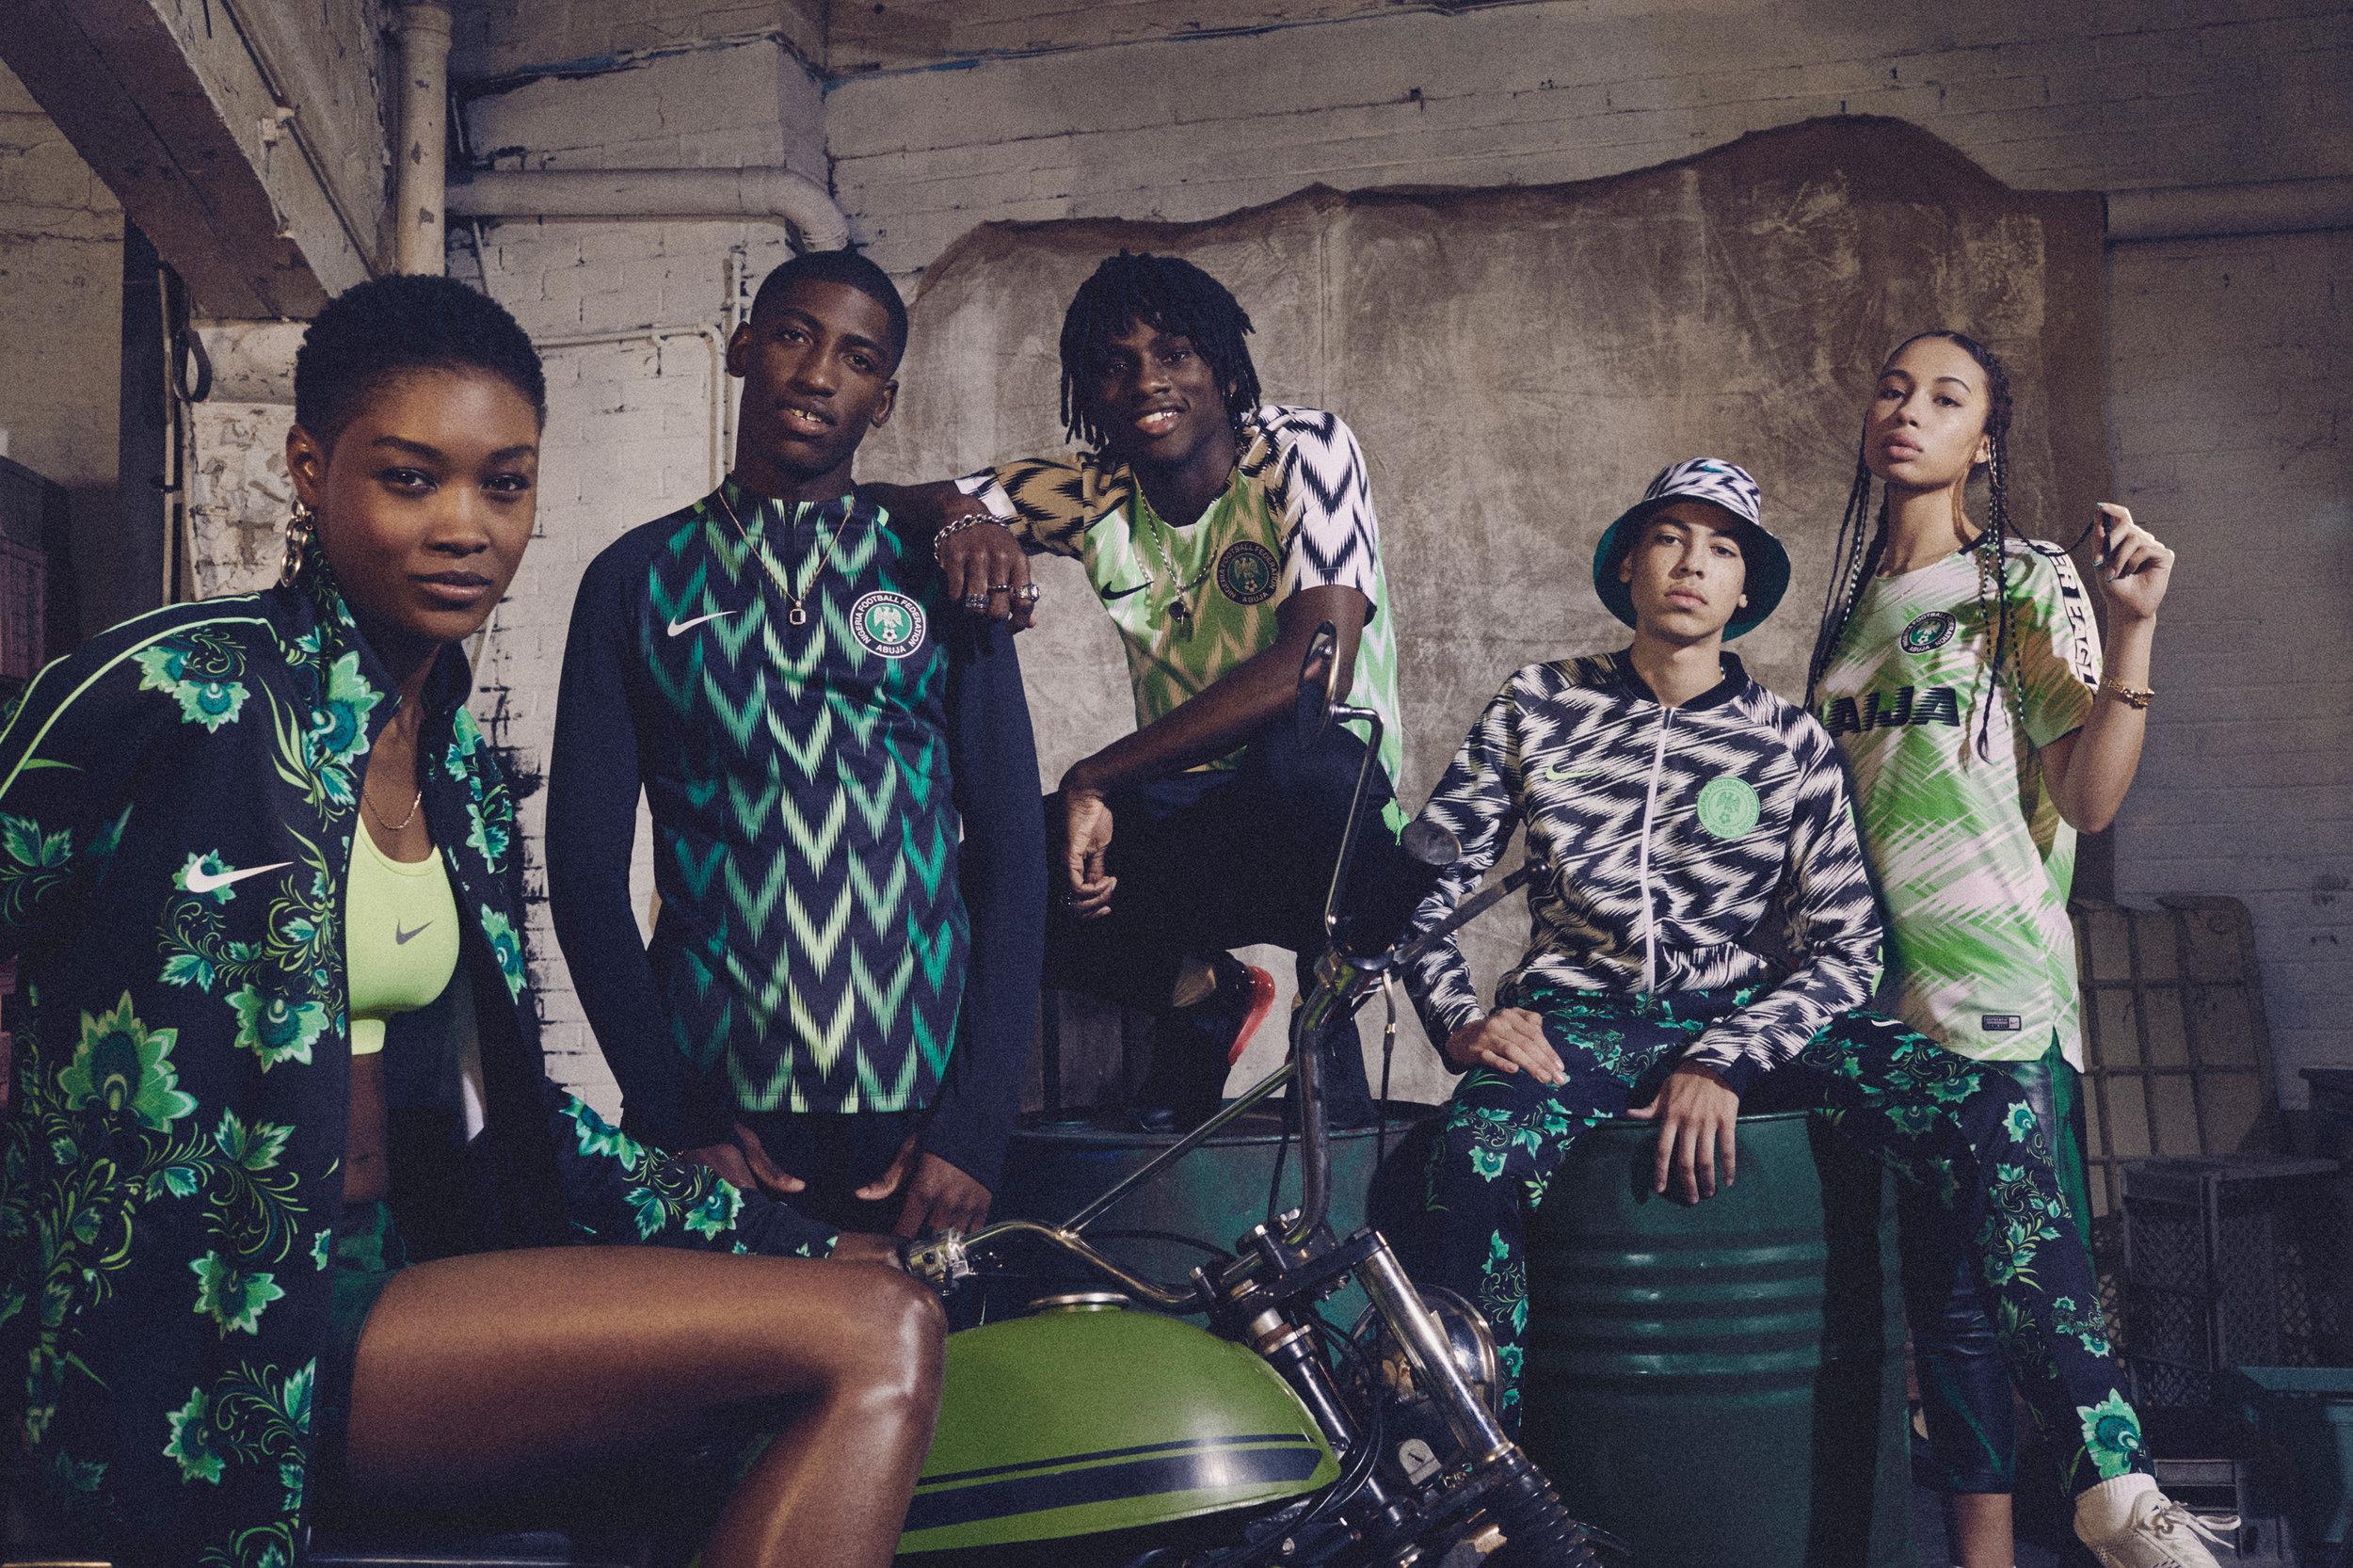 Nike-News-Football-Soccer-Nigeria-National-Team-Kit-4_original.JPG